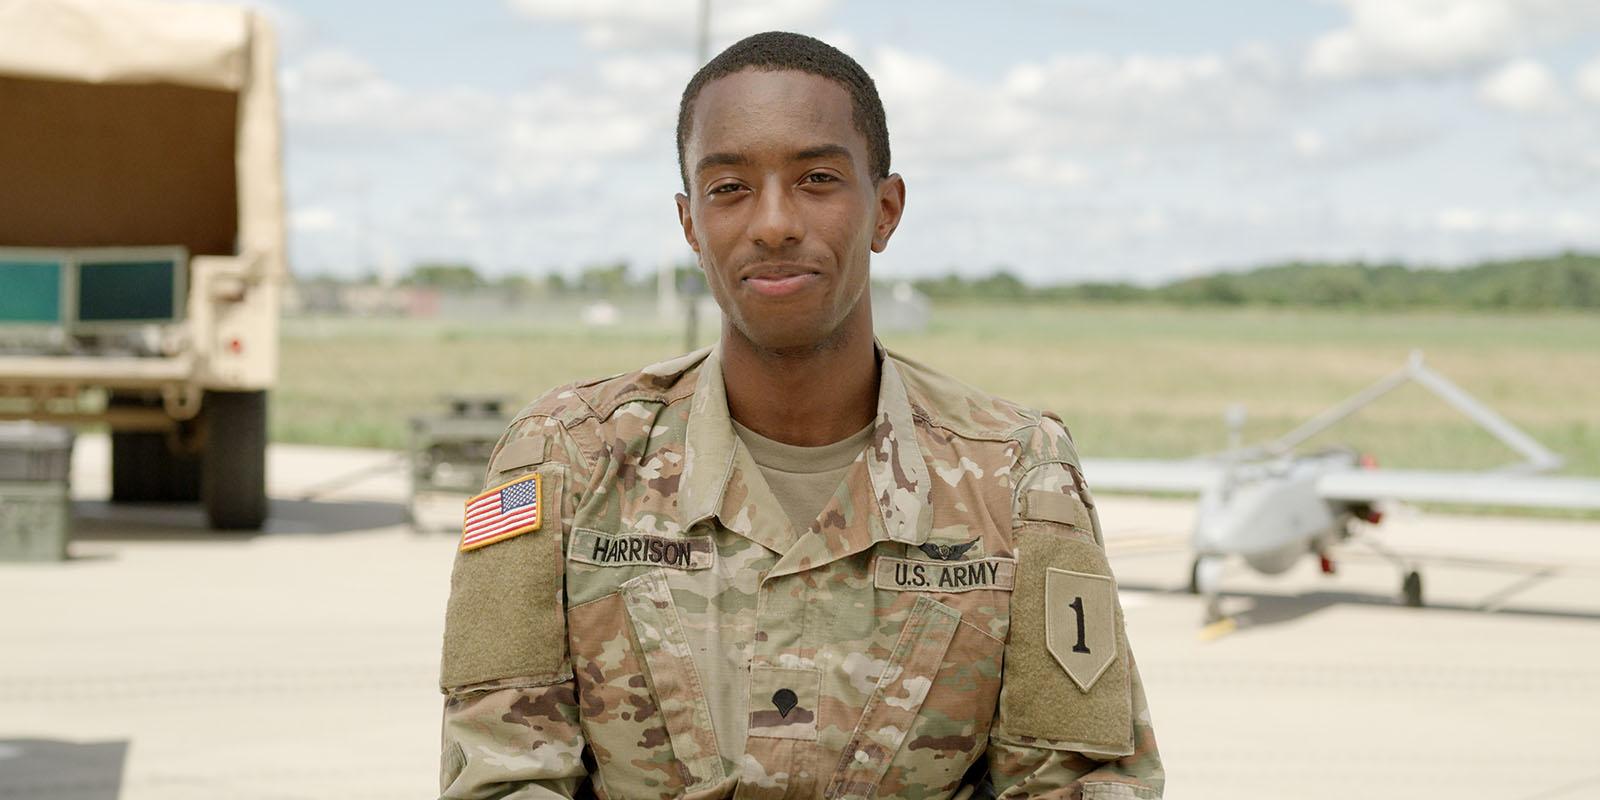 Sgt. Javaughn Harrison, UAS Operator, US Army